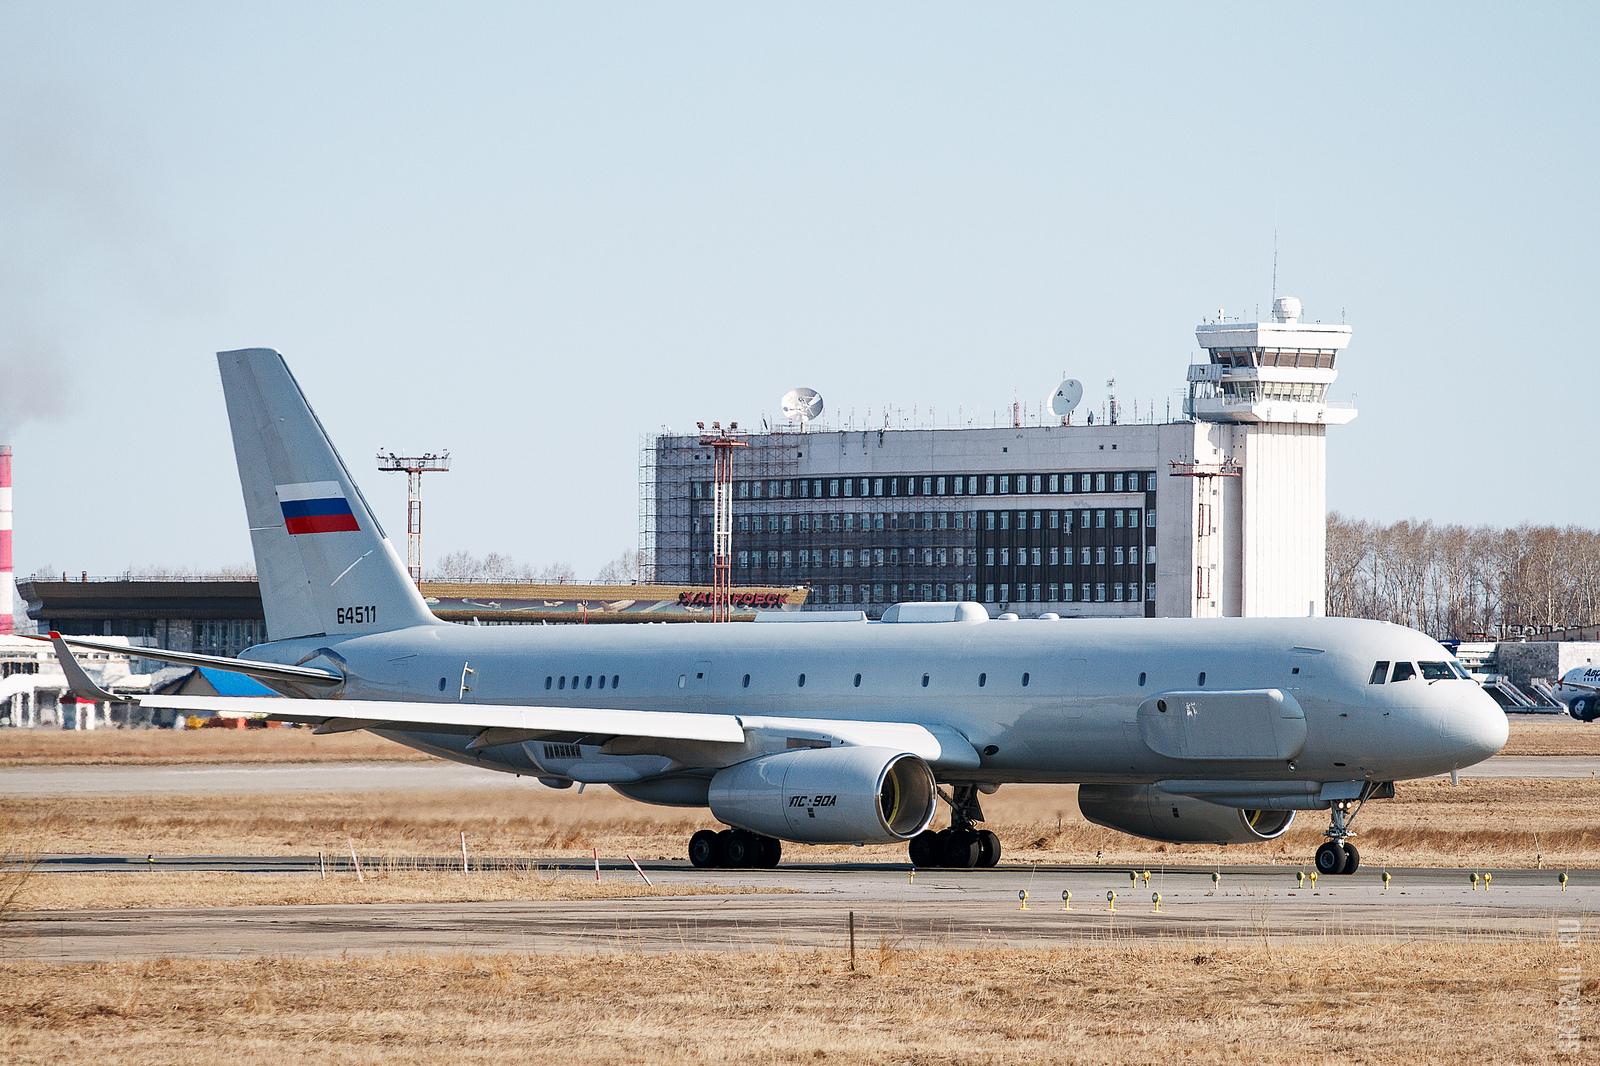 Tu214R (8)